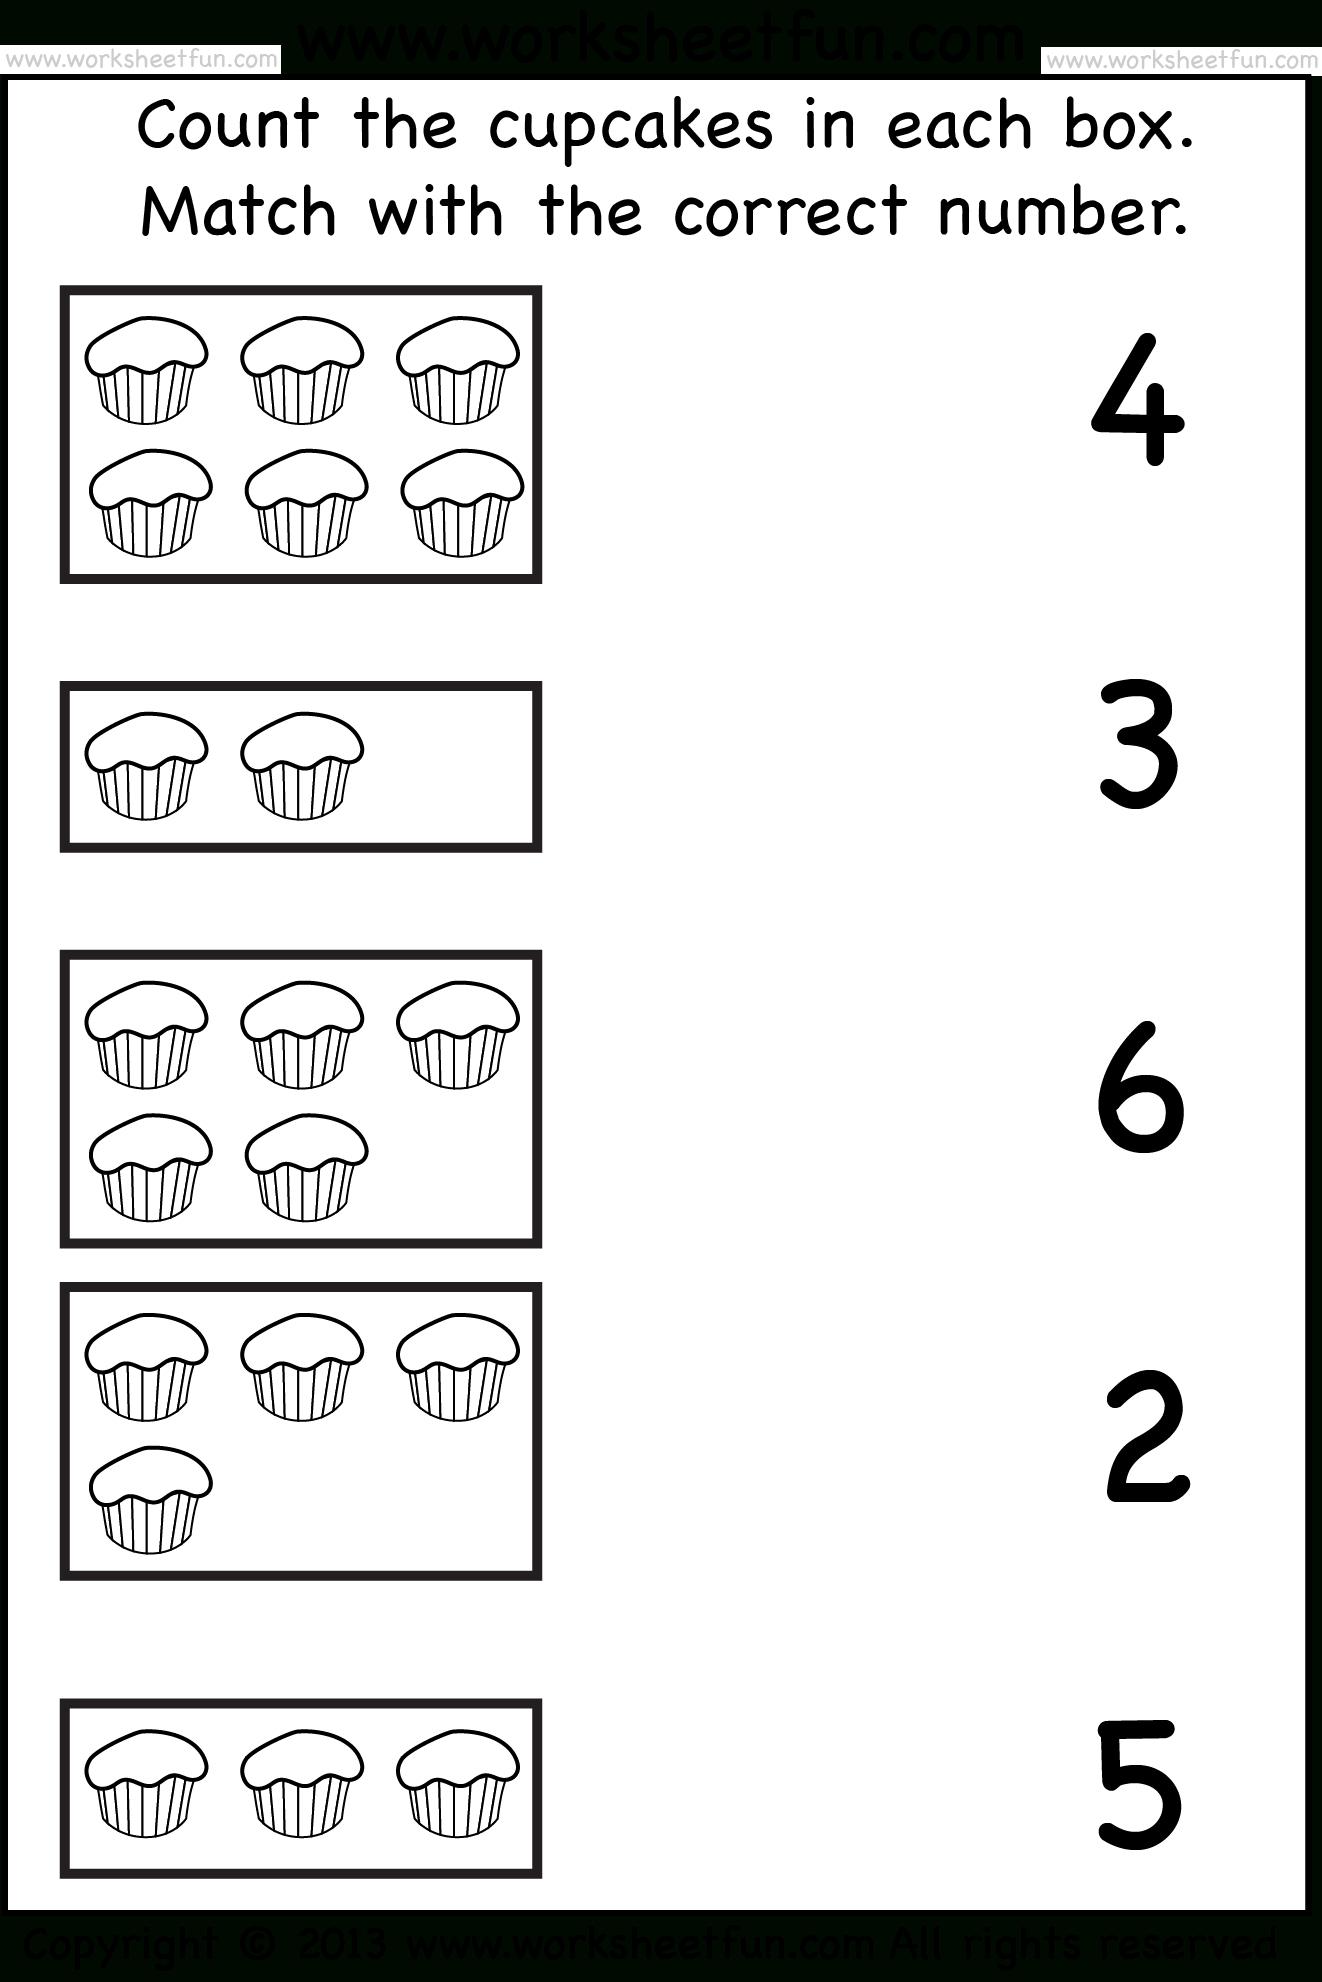 Tellen En Match_Cupcakes_Wfun_1 | -Printables- | Free Kindergarten | Counting Printable Worksheets For Kindergarten